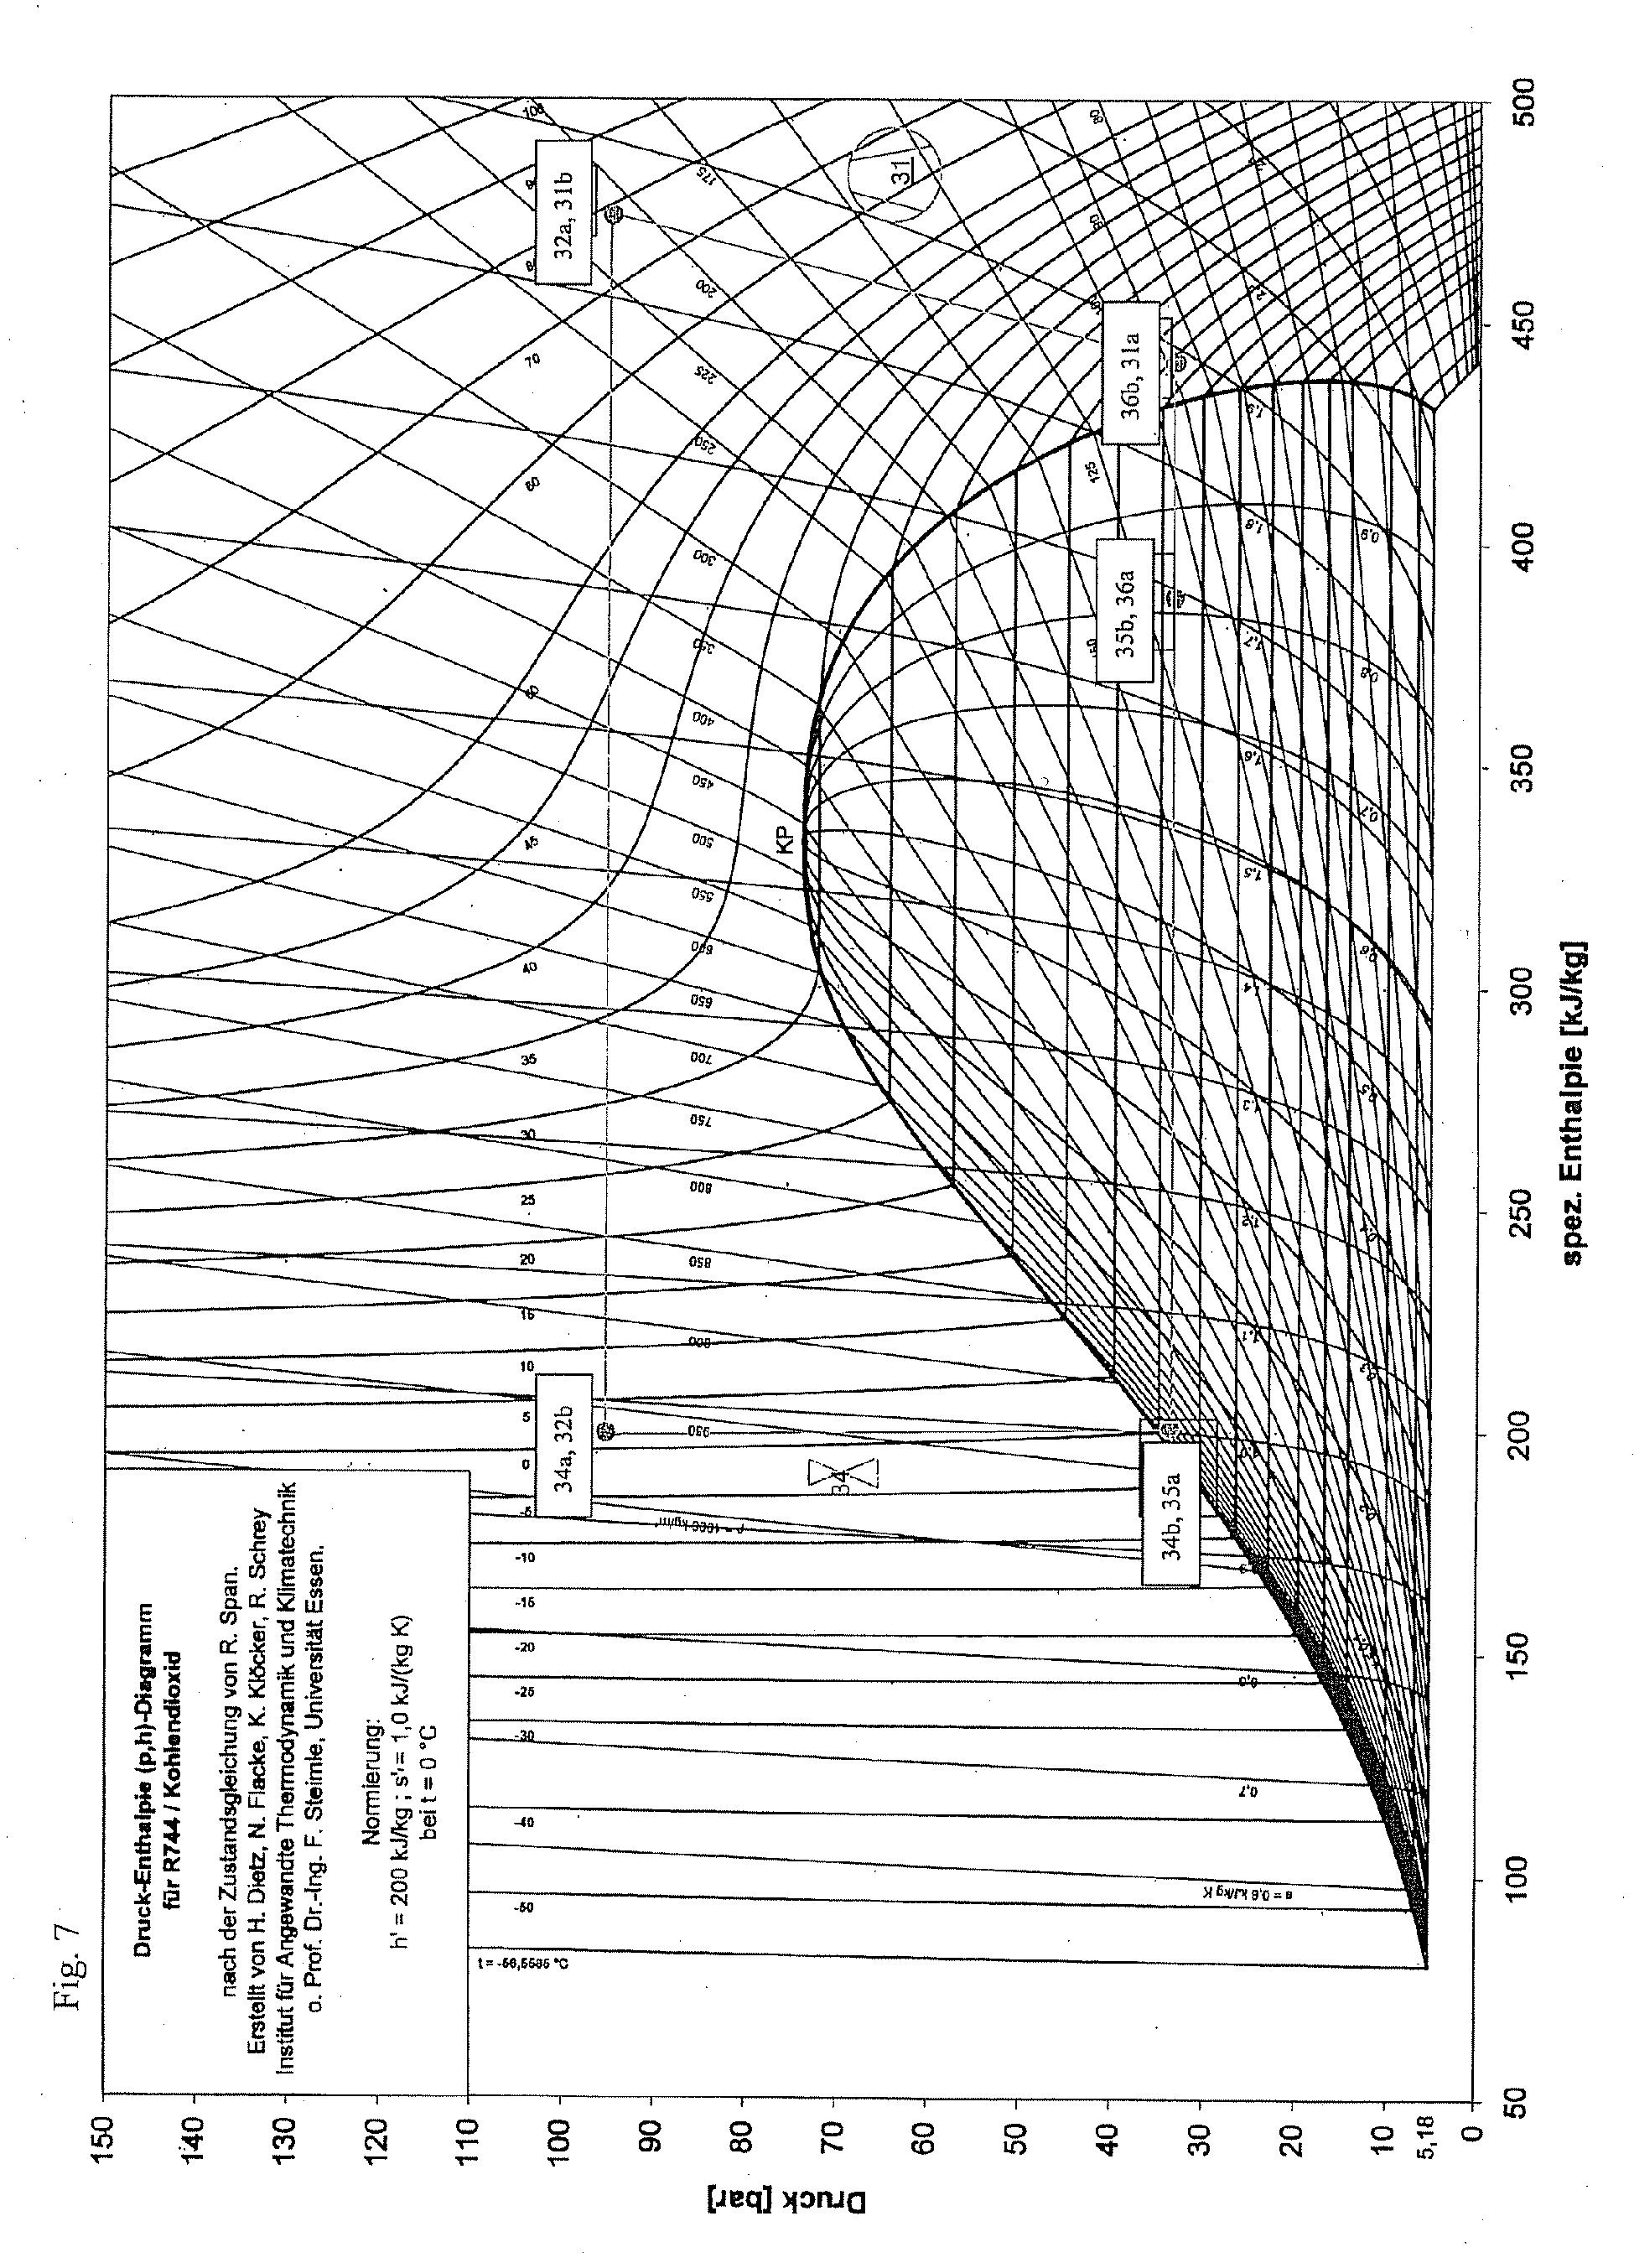 Colorful Ph Diagramm Gift - FORTSETZUNG ARBEITSBLATT - tsuhaan.info